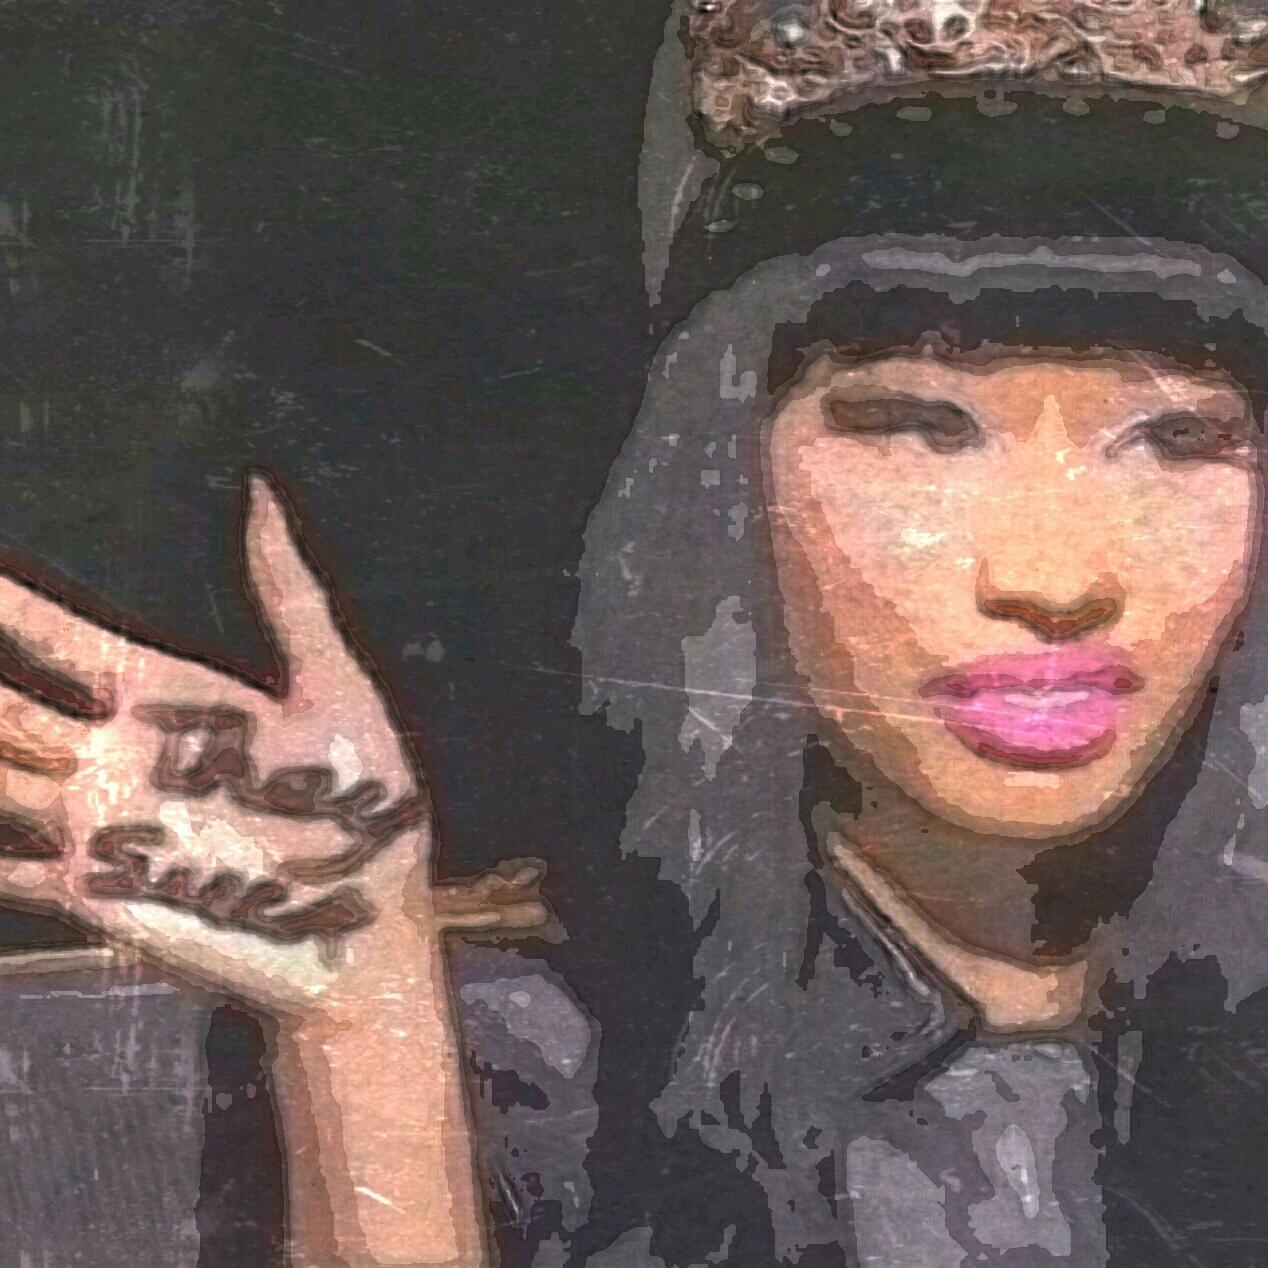 http://4.bp.blogspot.com/-4AV5JJmCbi0/USHN4PNN2hI/AAAAAAAAAdU/u-_LnznF4fk/s1600/American_Idol_Season12_they_suck_Nicki_Minaj.jpg